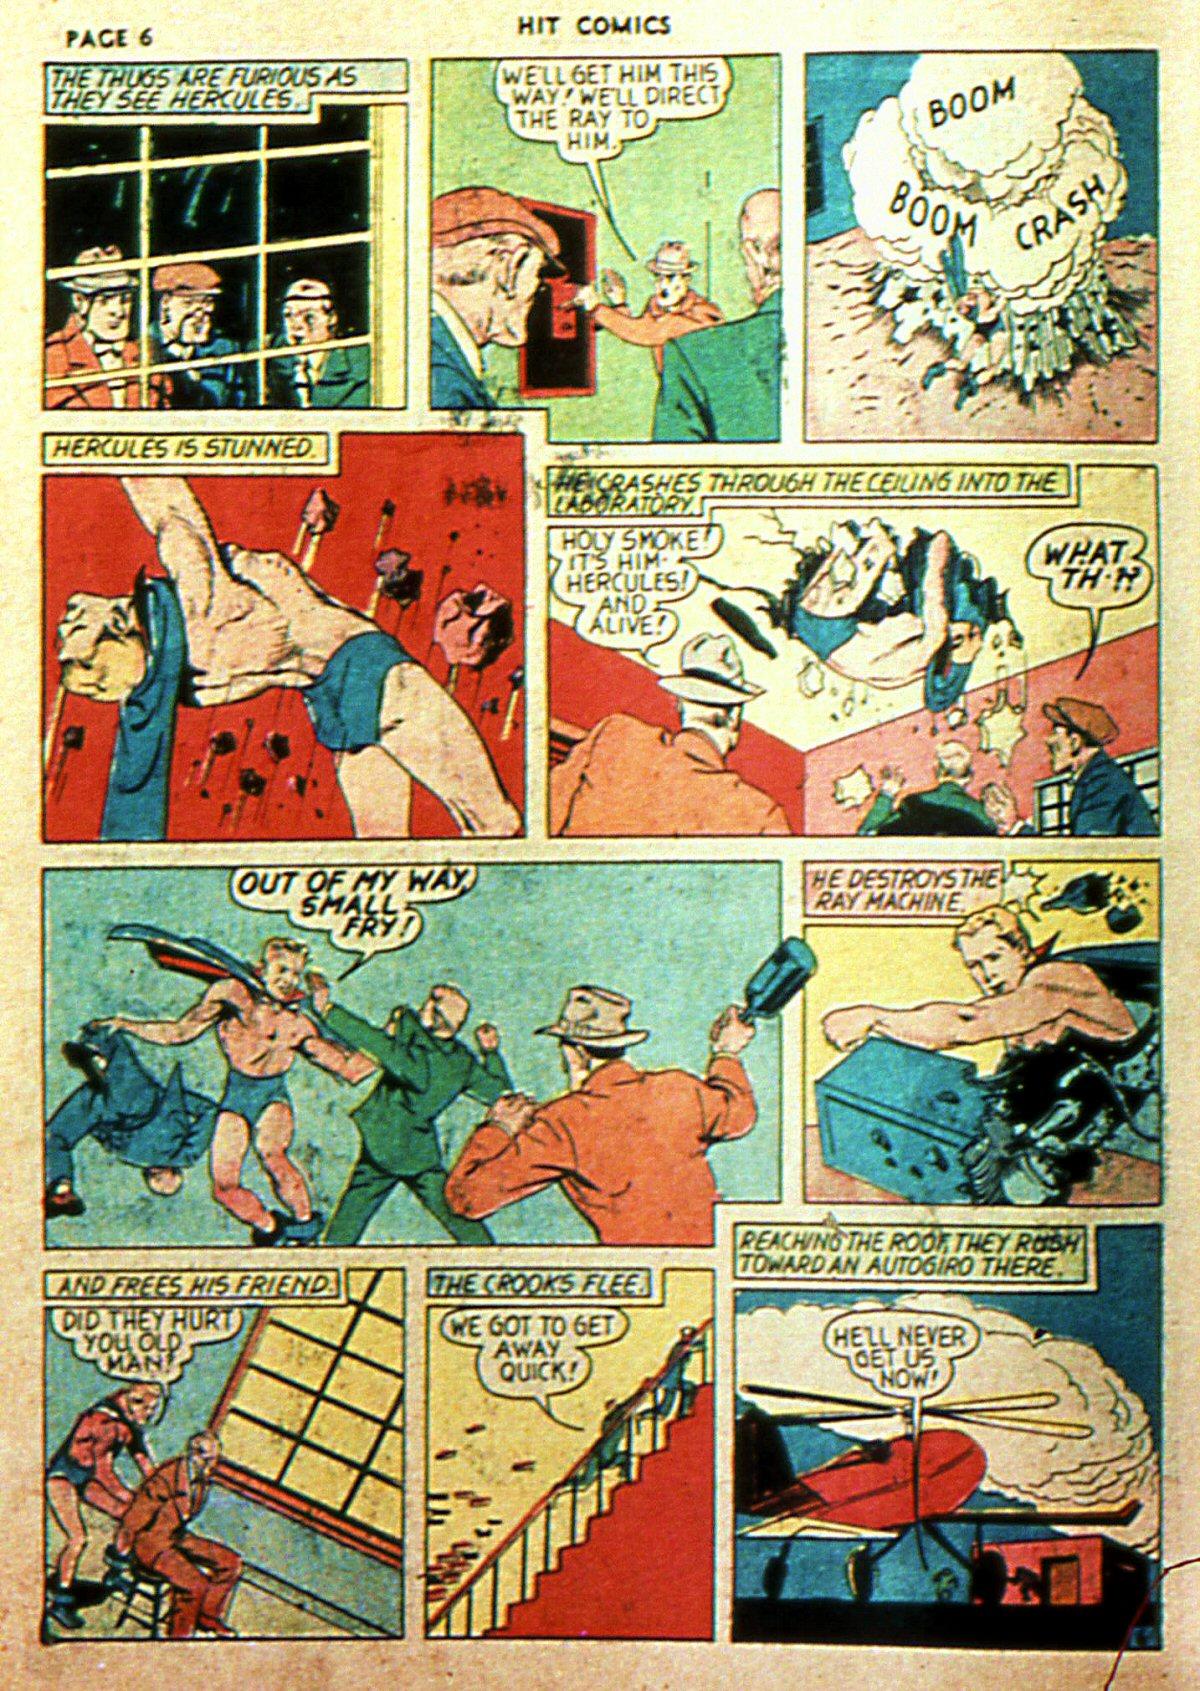 Read online Hit Comics comic -  Issue #2 - 8